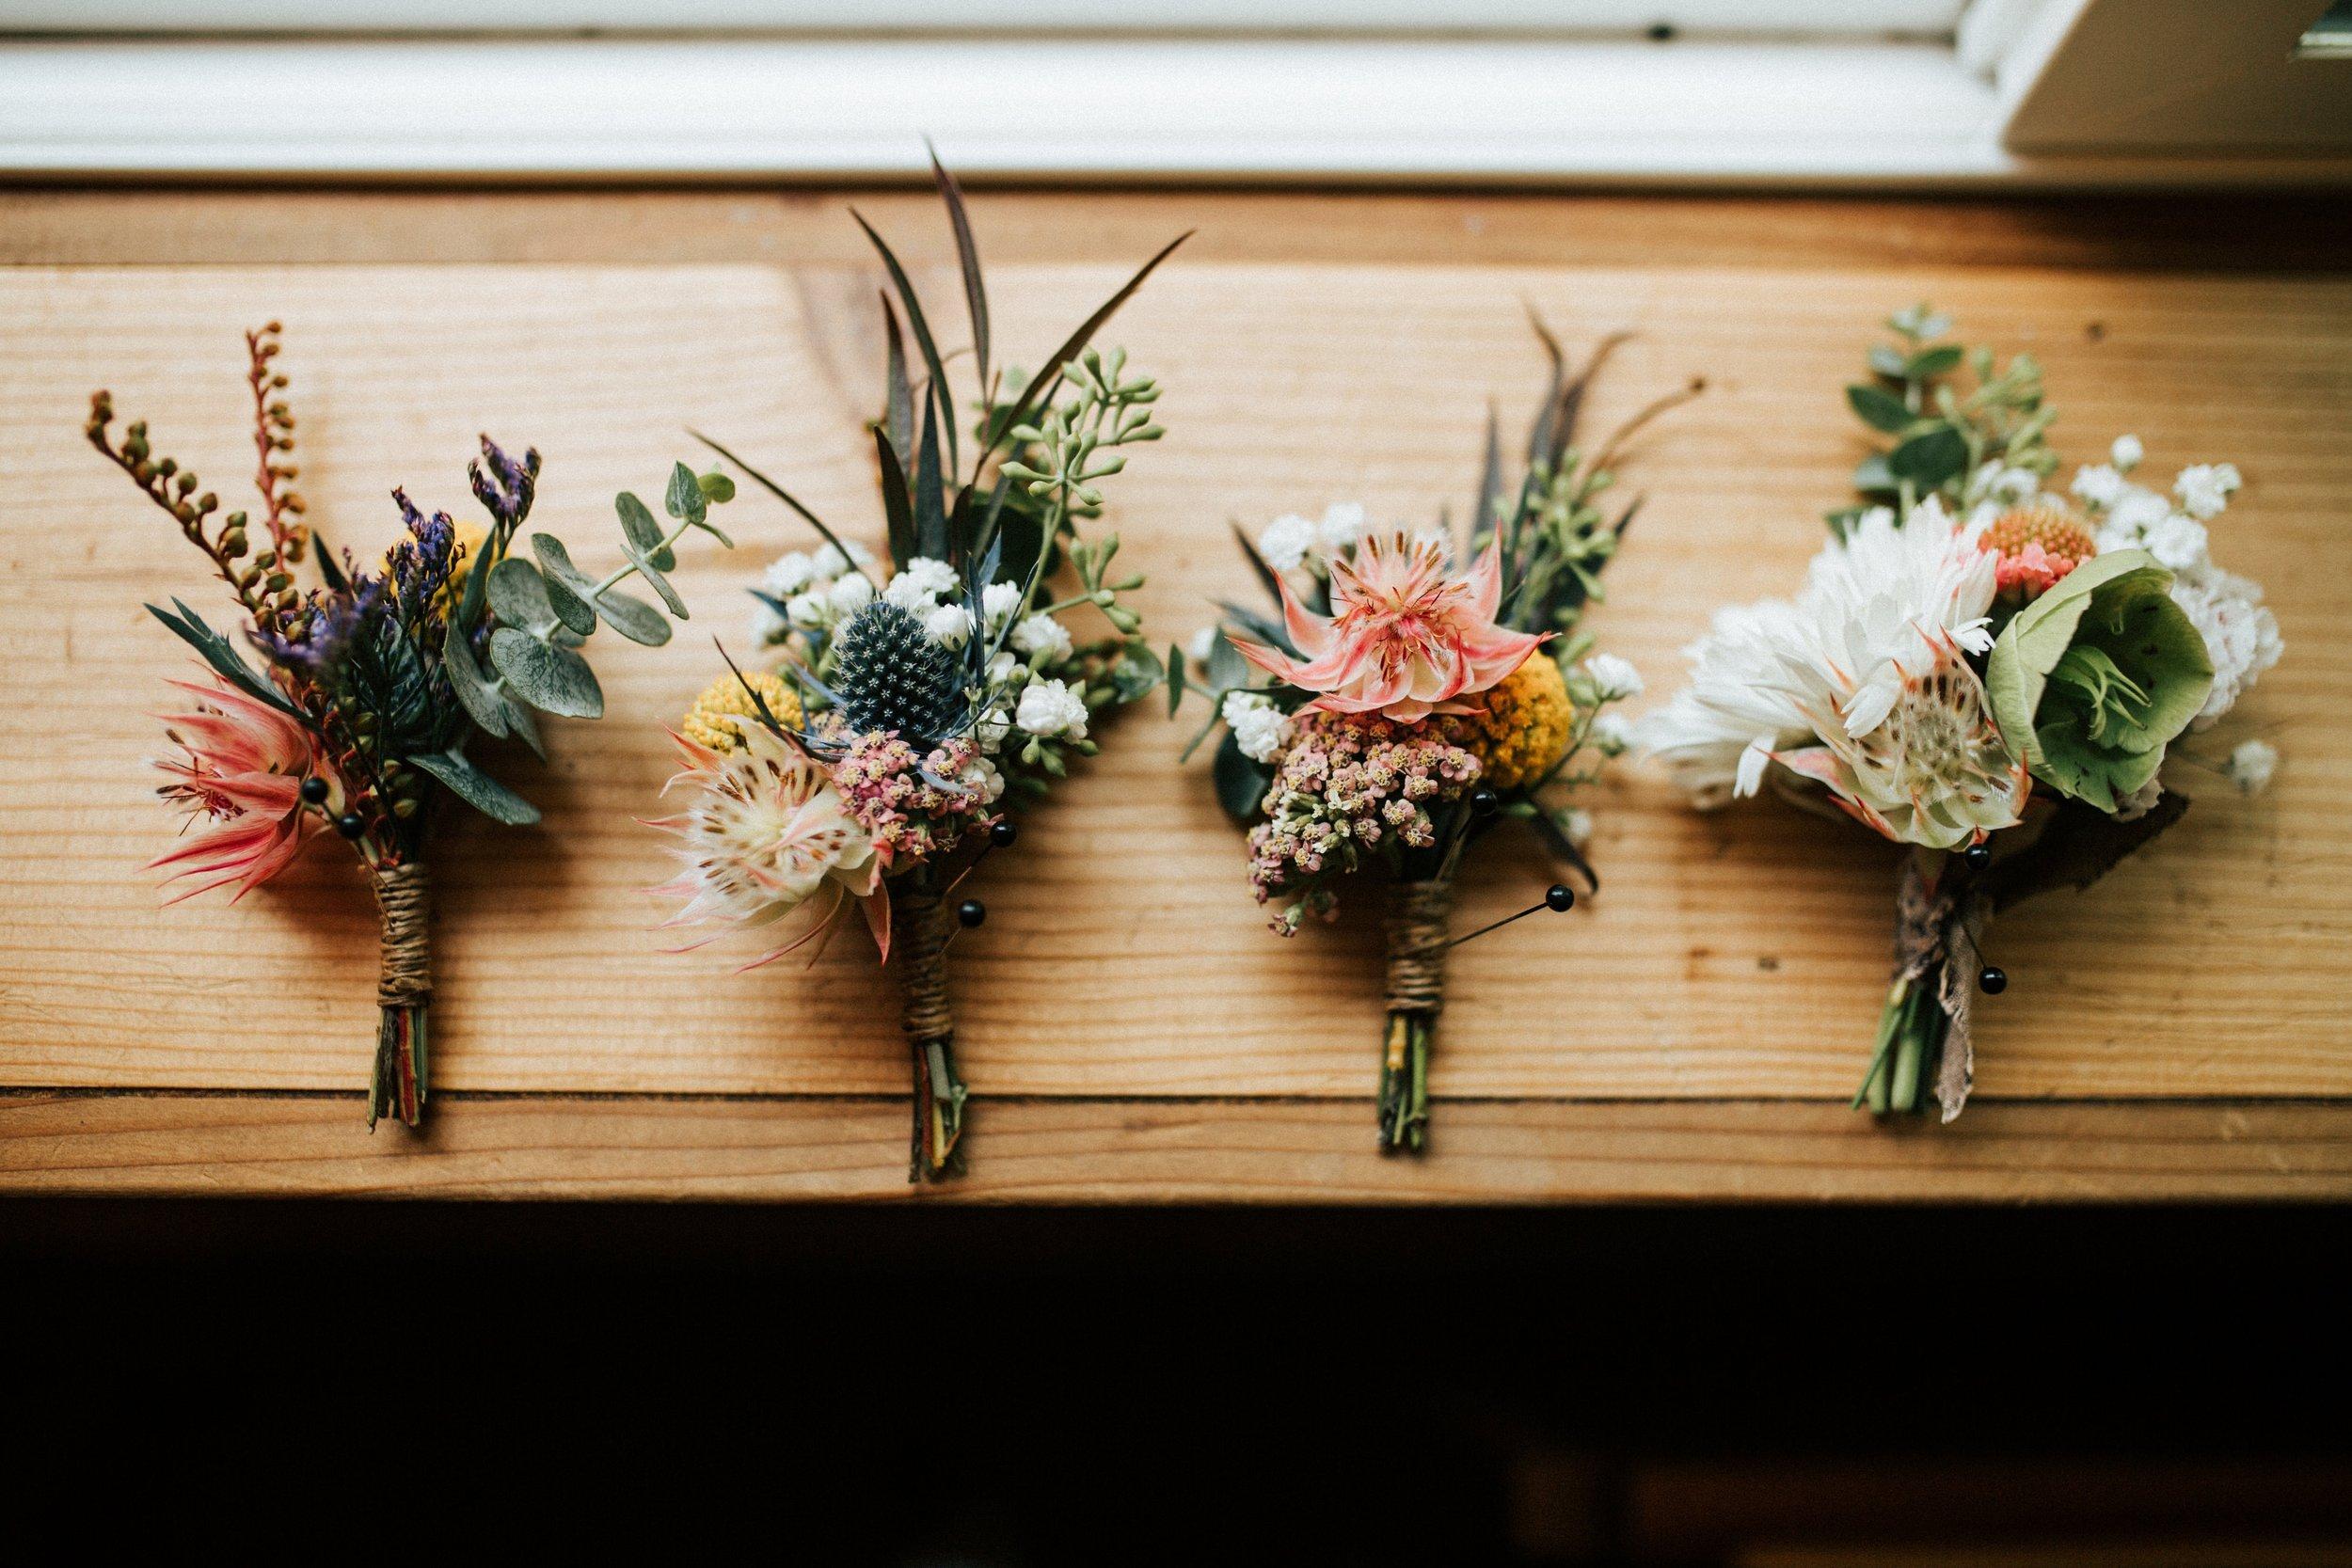 Click image for wedding floral inspiration!